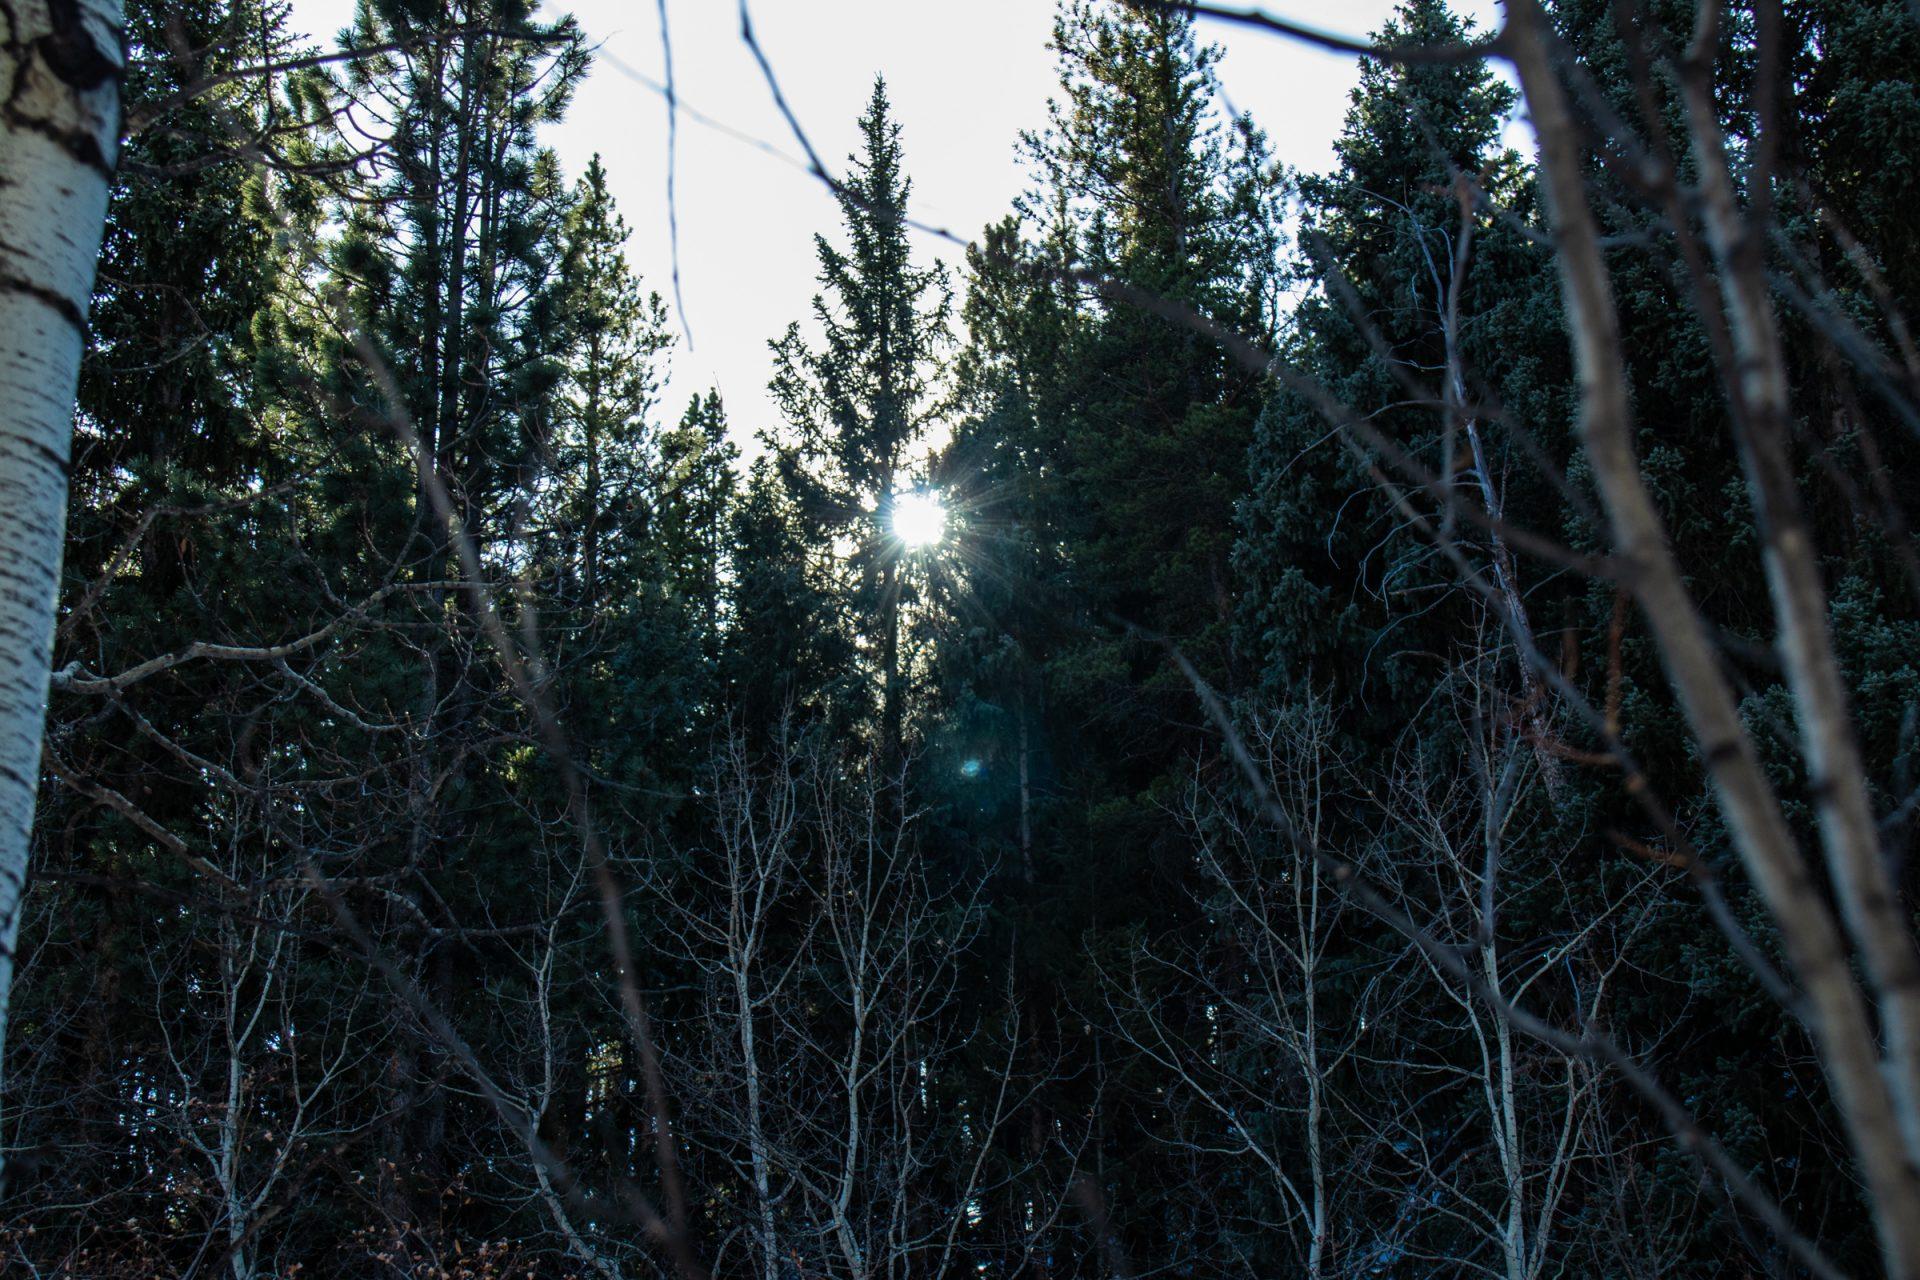 Sun Shining Faintly Through Trees